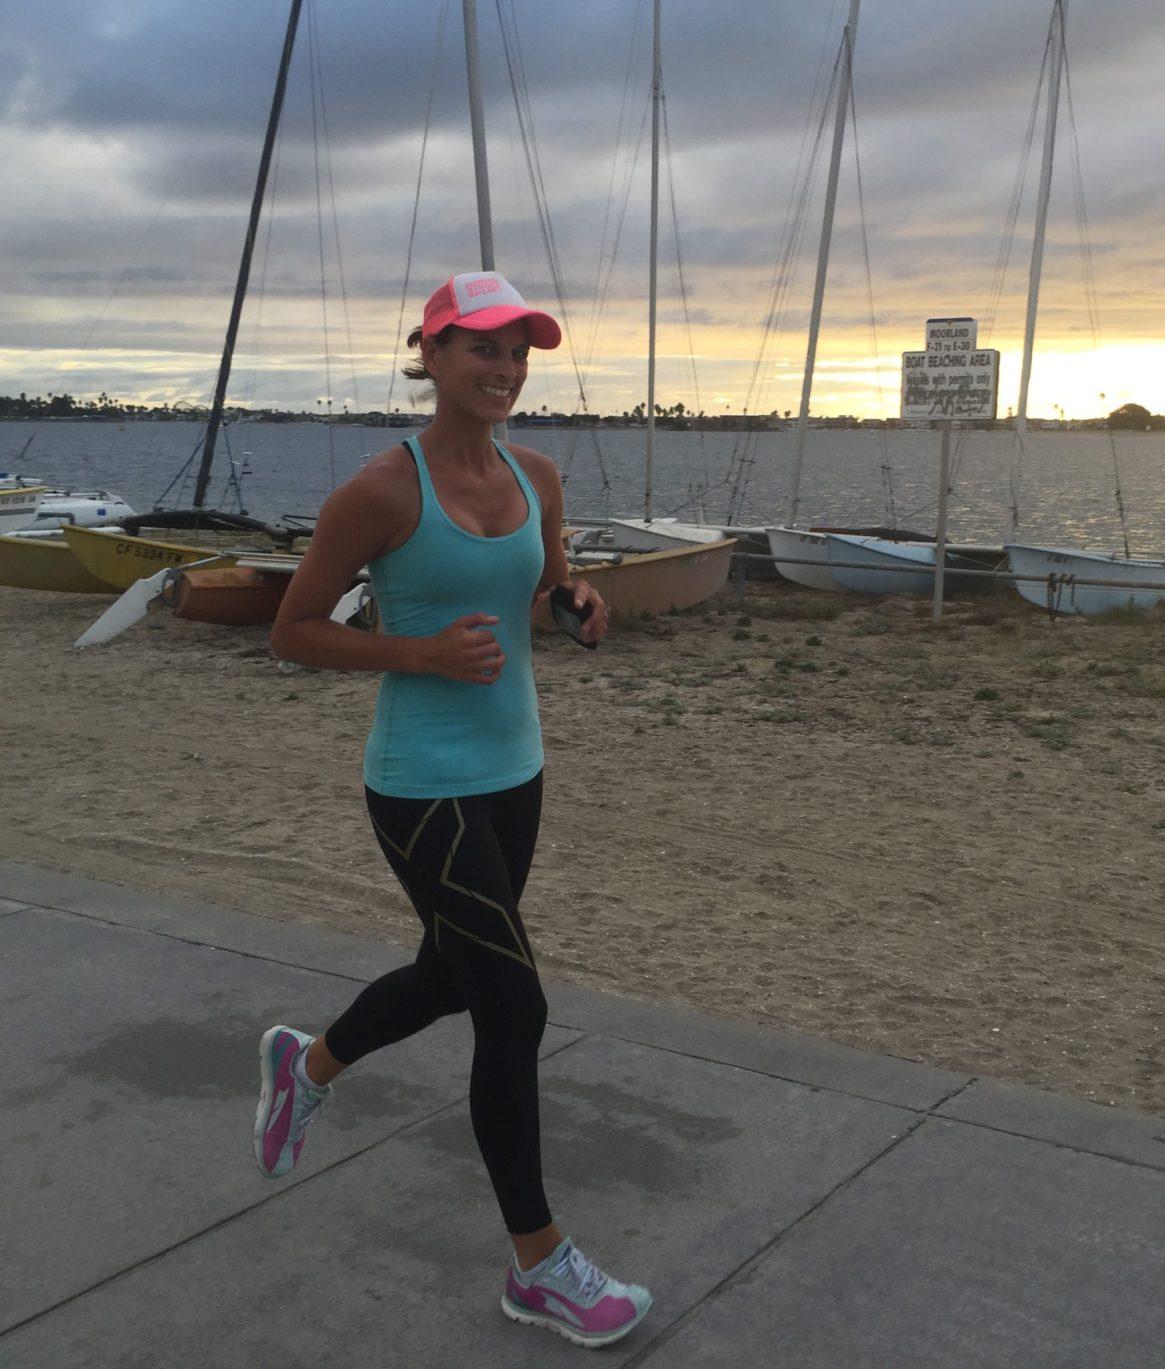 2XU, MCS Run, San Diego, Bibchat, Mission Bay, Altra Running, Running4thosewhocant